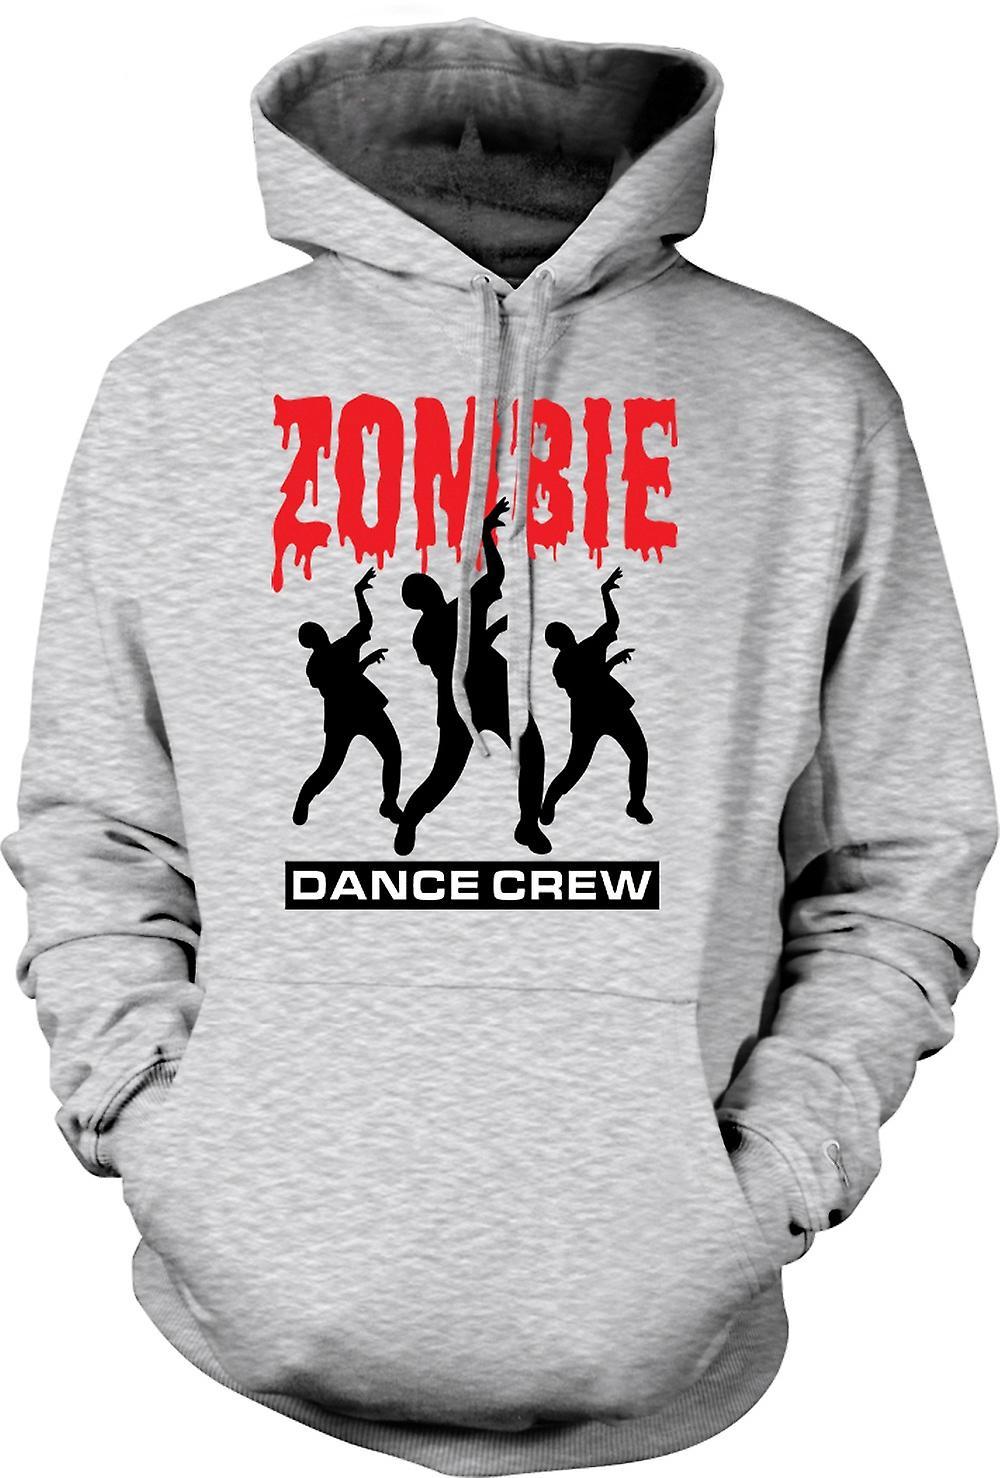 Para hombre con capucha - Zombie Dance Crew - Horror divertido